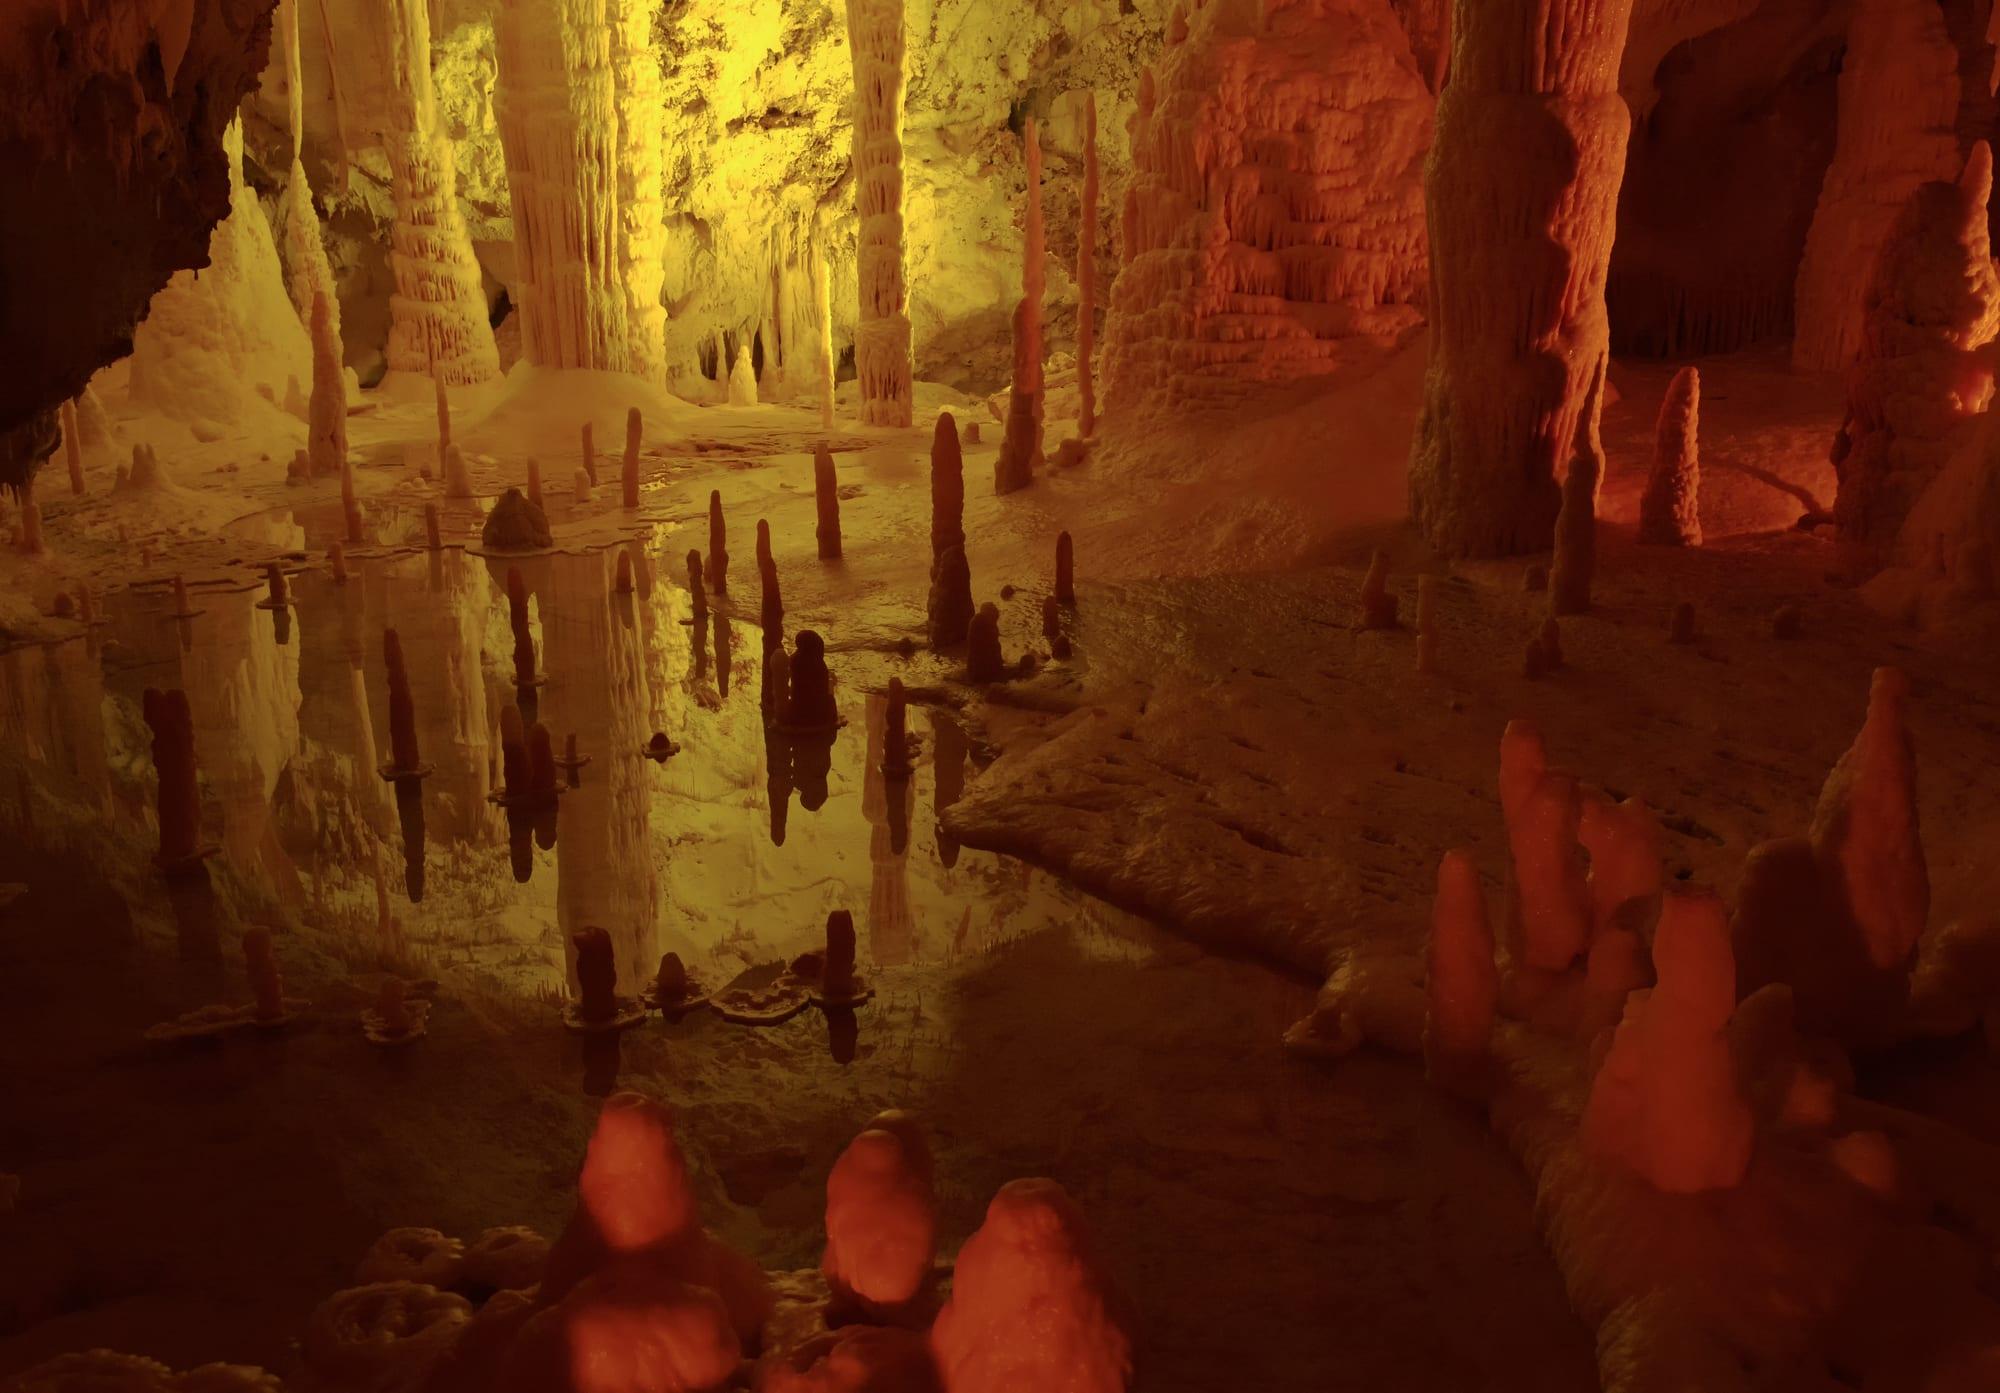 Grotte di Frassasi